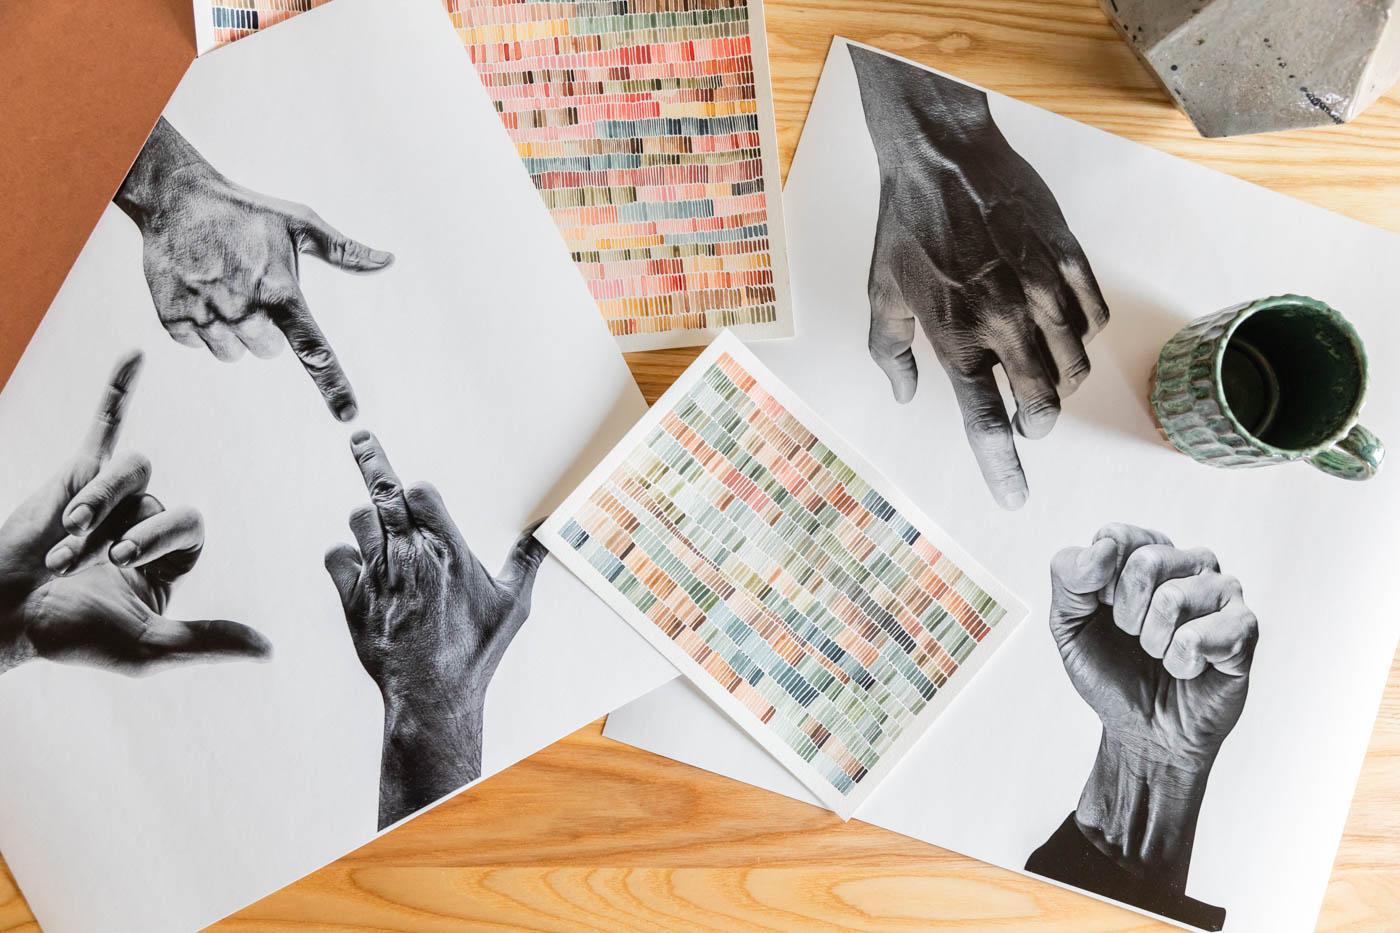 ArtistLoft-DenverCO-natural-light-photography-studio-lifestyle-photoshoot-location-editorial-commercial-photography-10.jpg